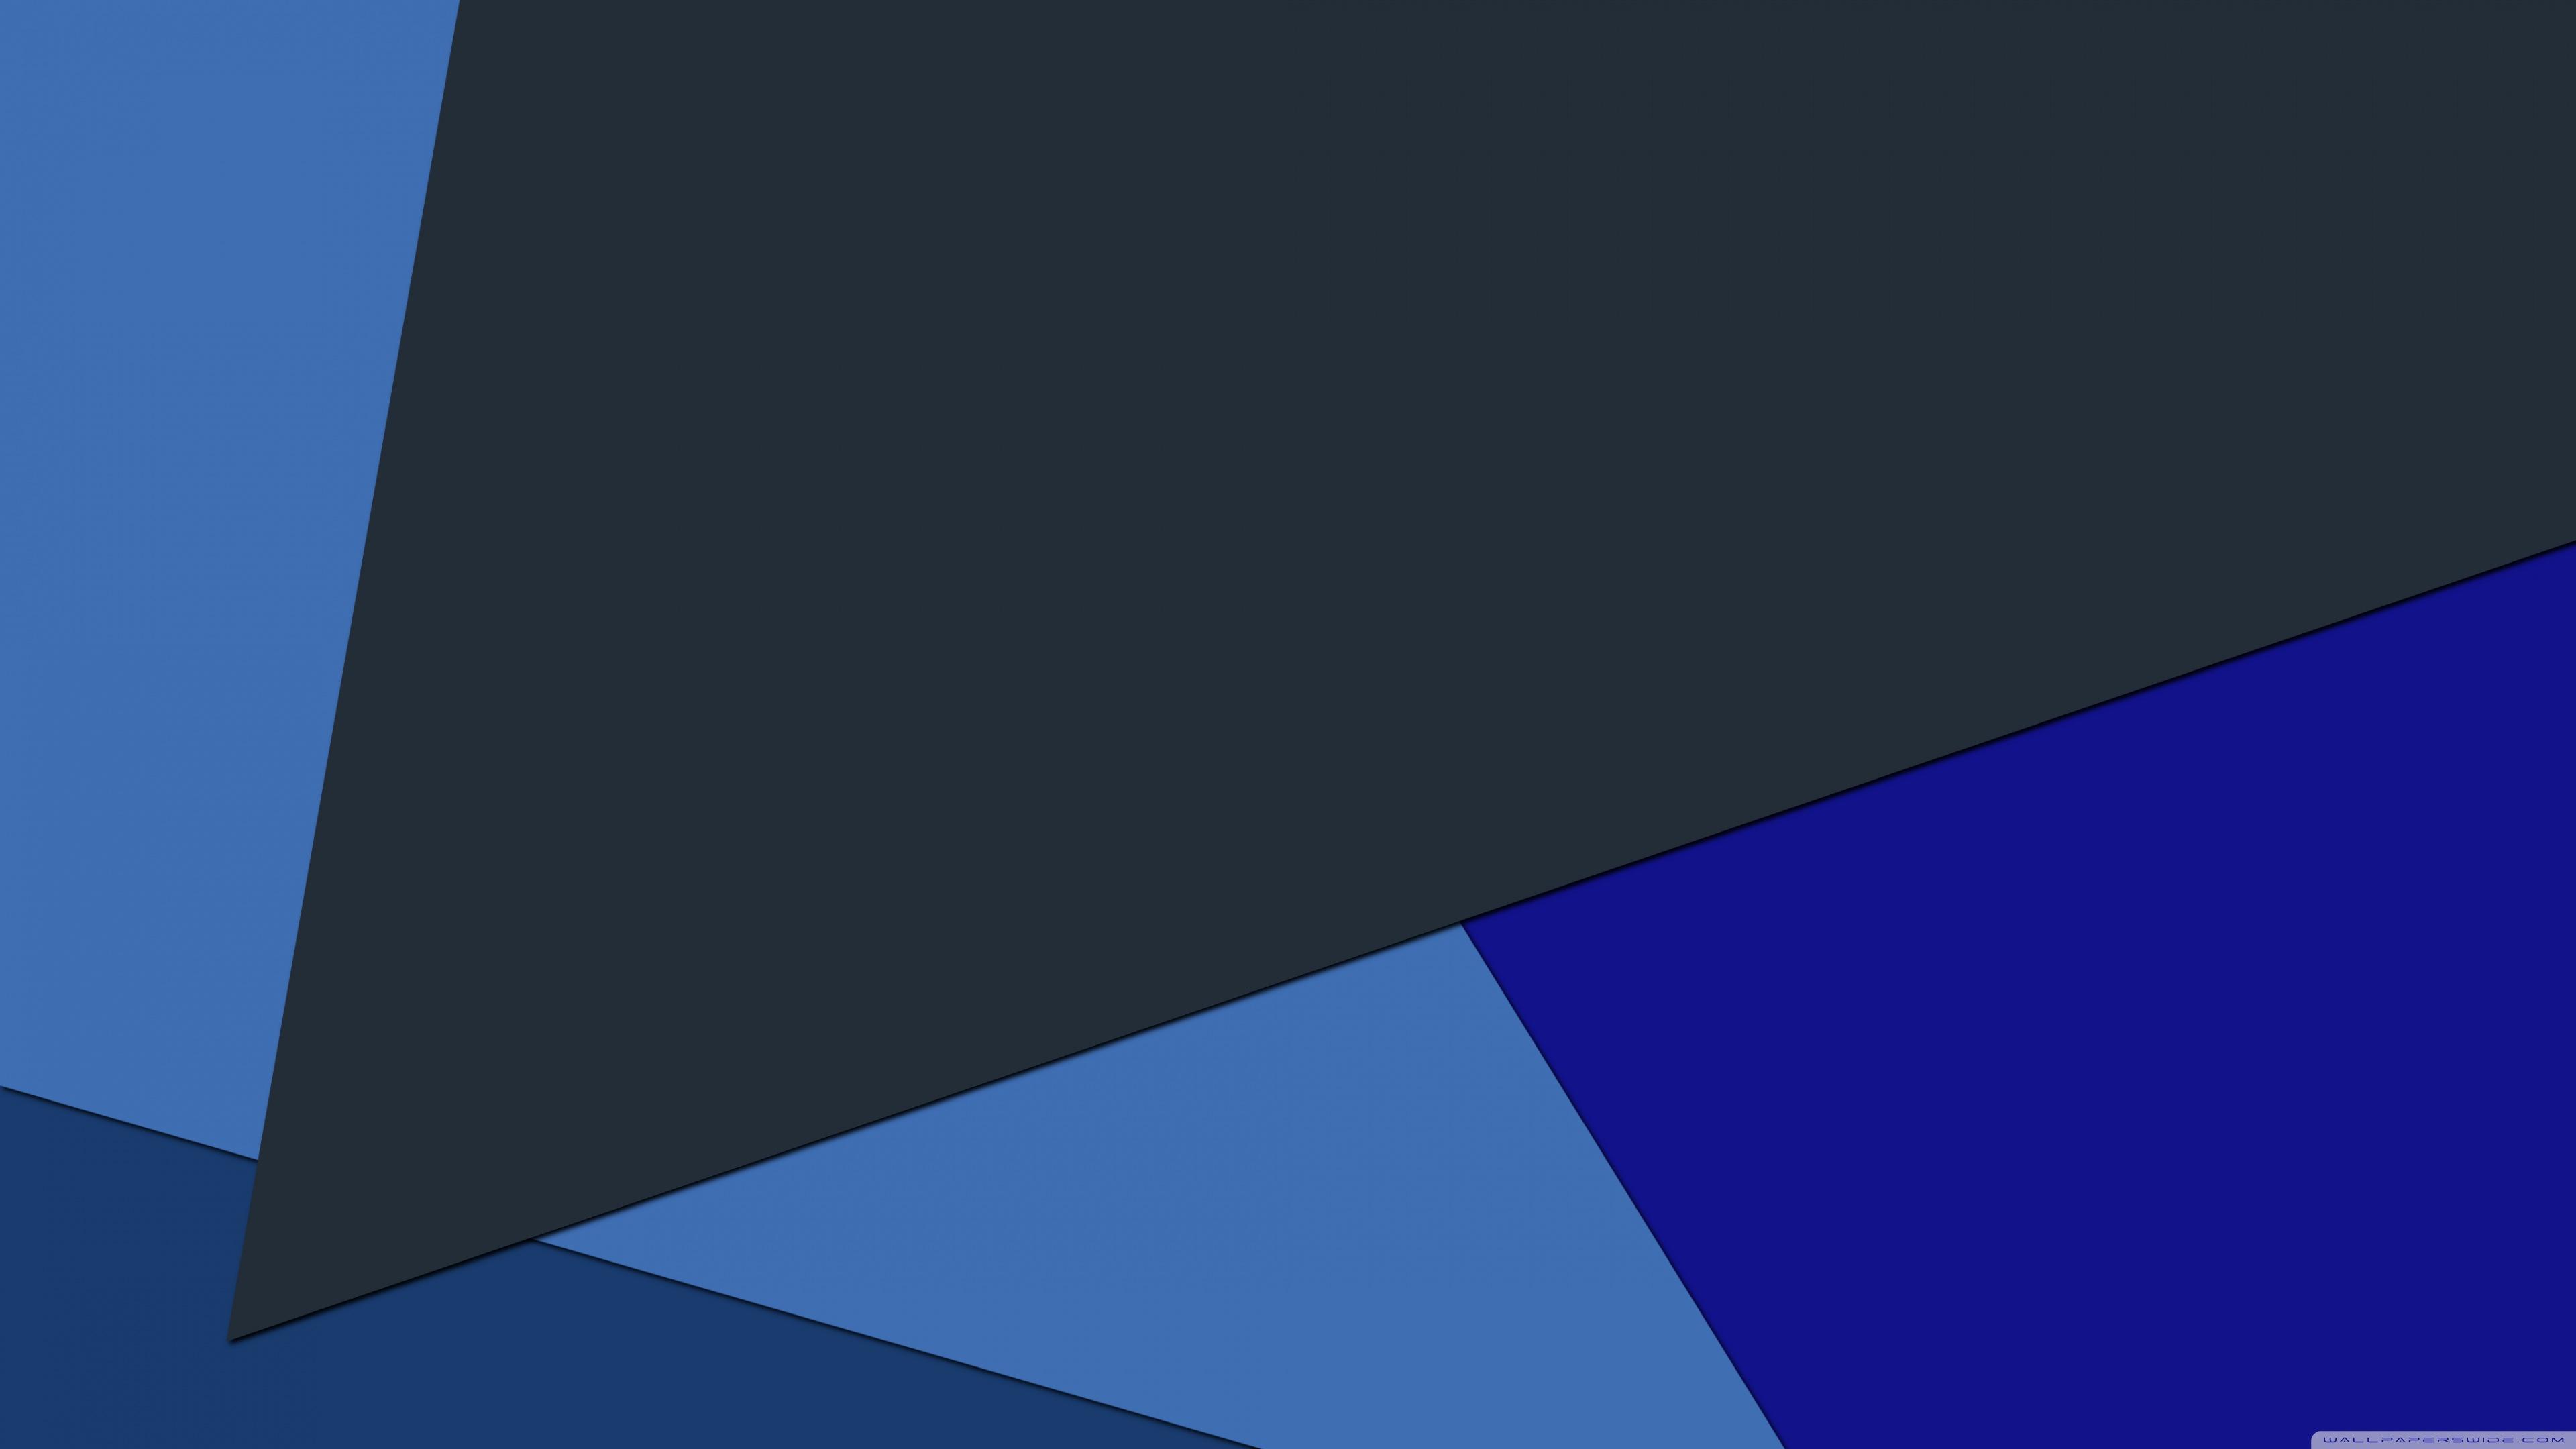 Blue and Grey HD desktop wallpaper : Widescreen : Fullscreen